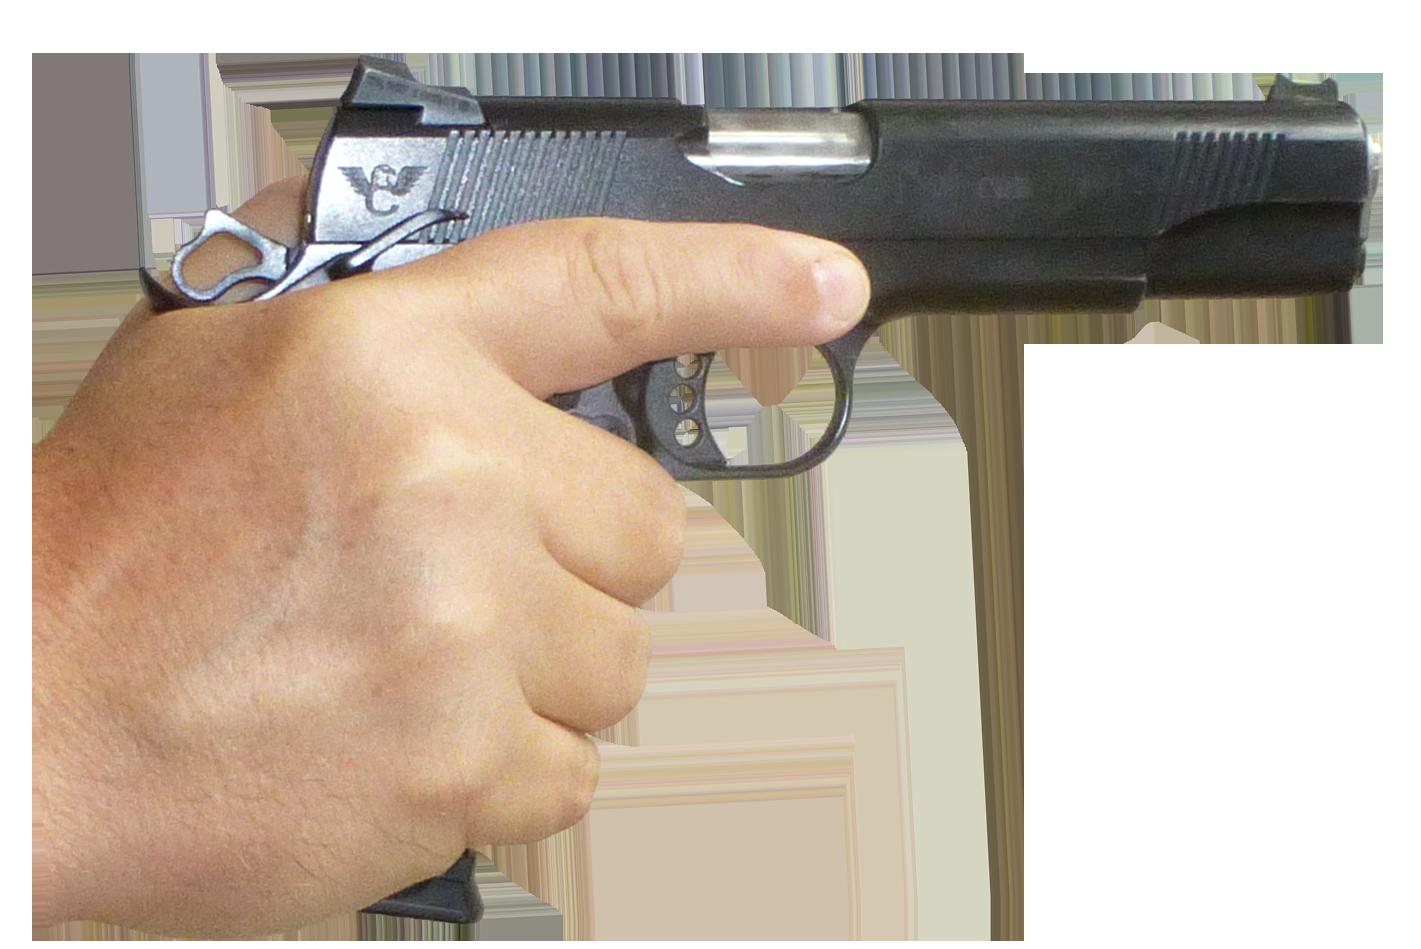 Gun In Hand PNG Image.